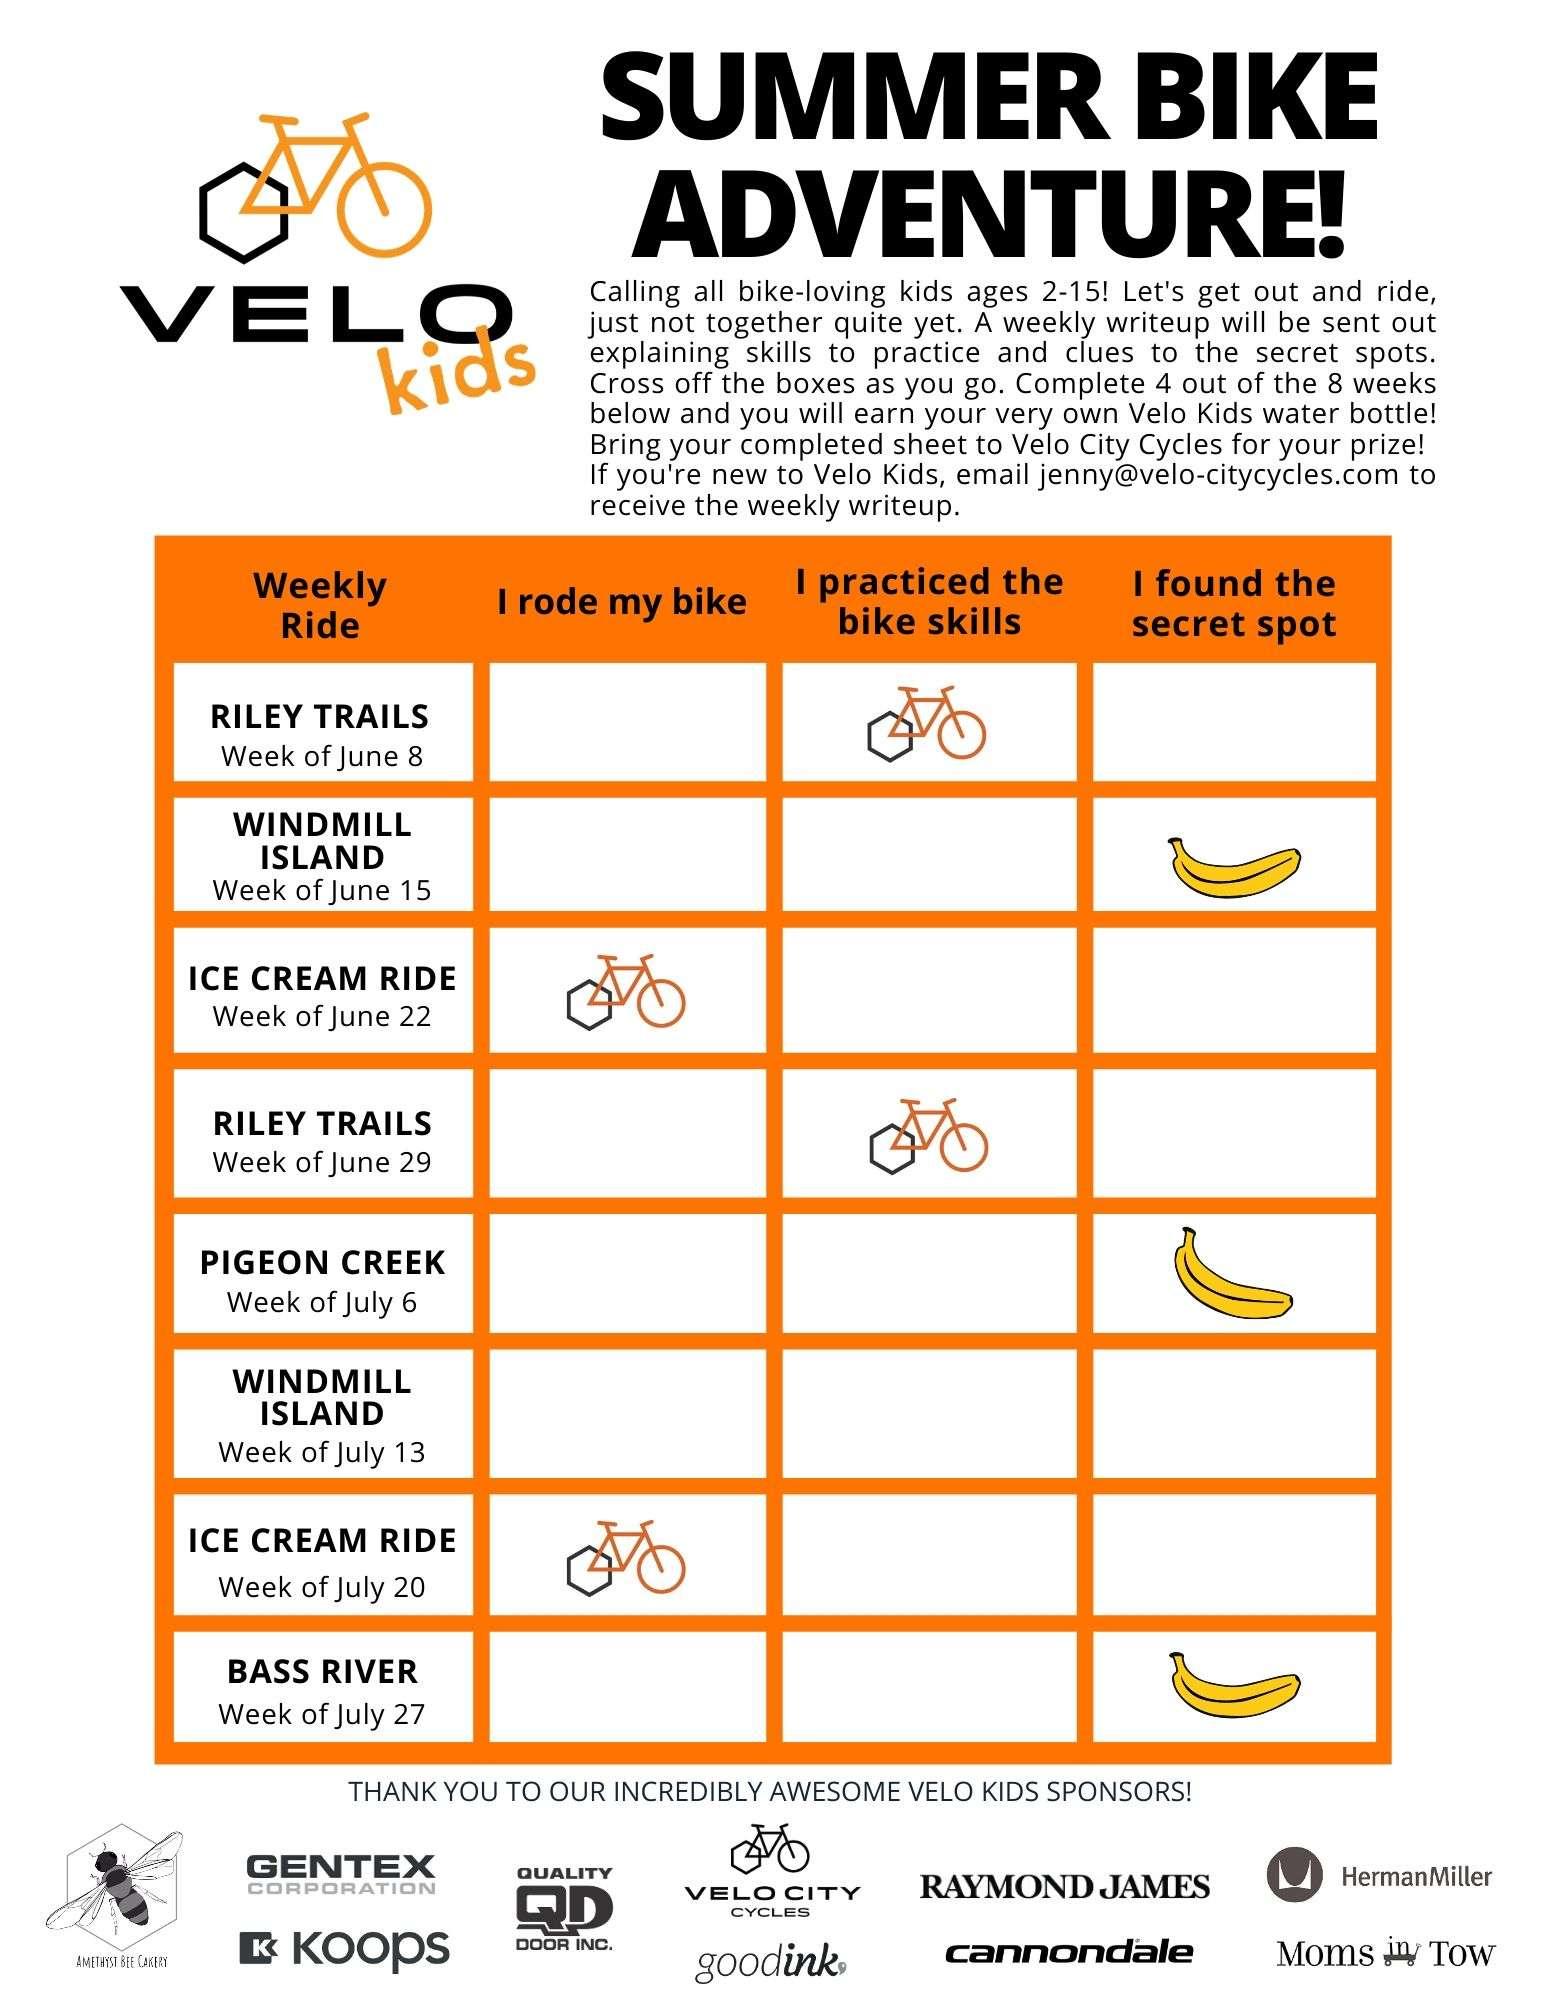 Summer Bike Adventure Weekly Ride Sheet